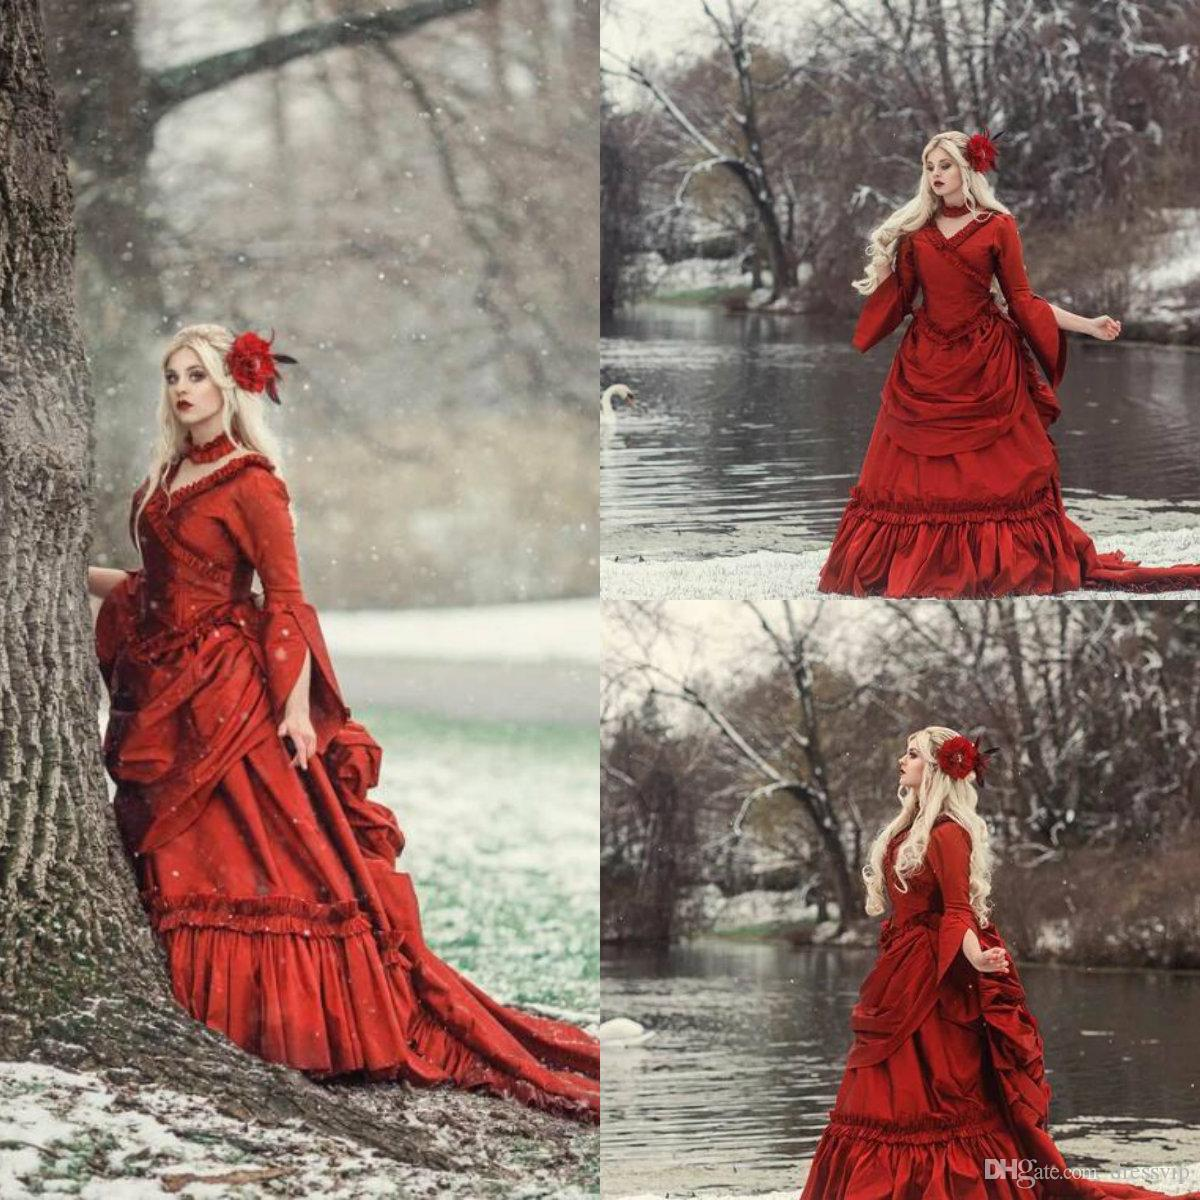 2020 Red Gothic Wedding Dresses V Neck Ruffles Long Sleeve Vintage Victorian Bridal Dress Tiered Skirts Satin Vestidos De Novia